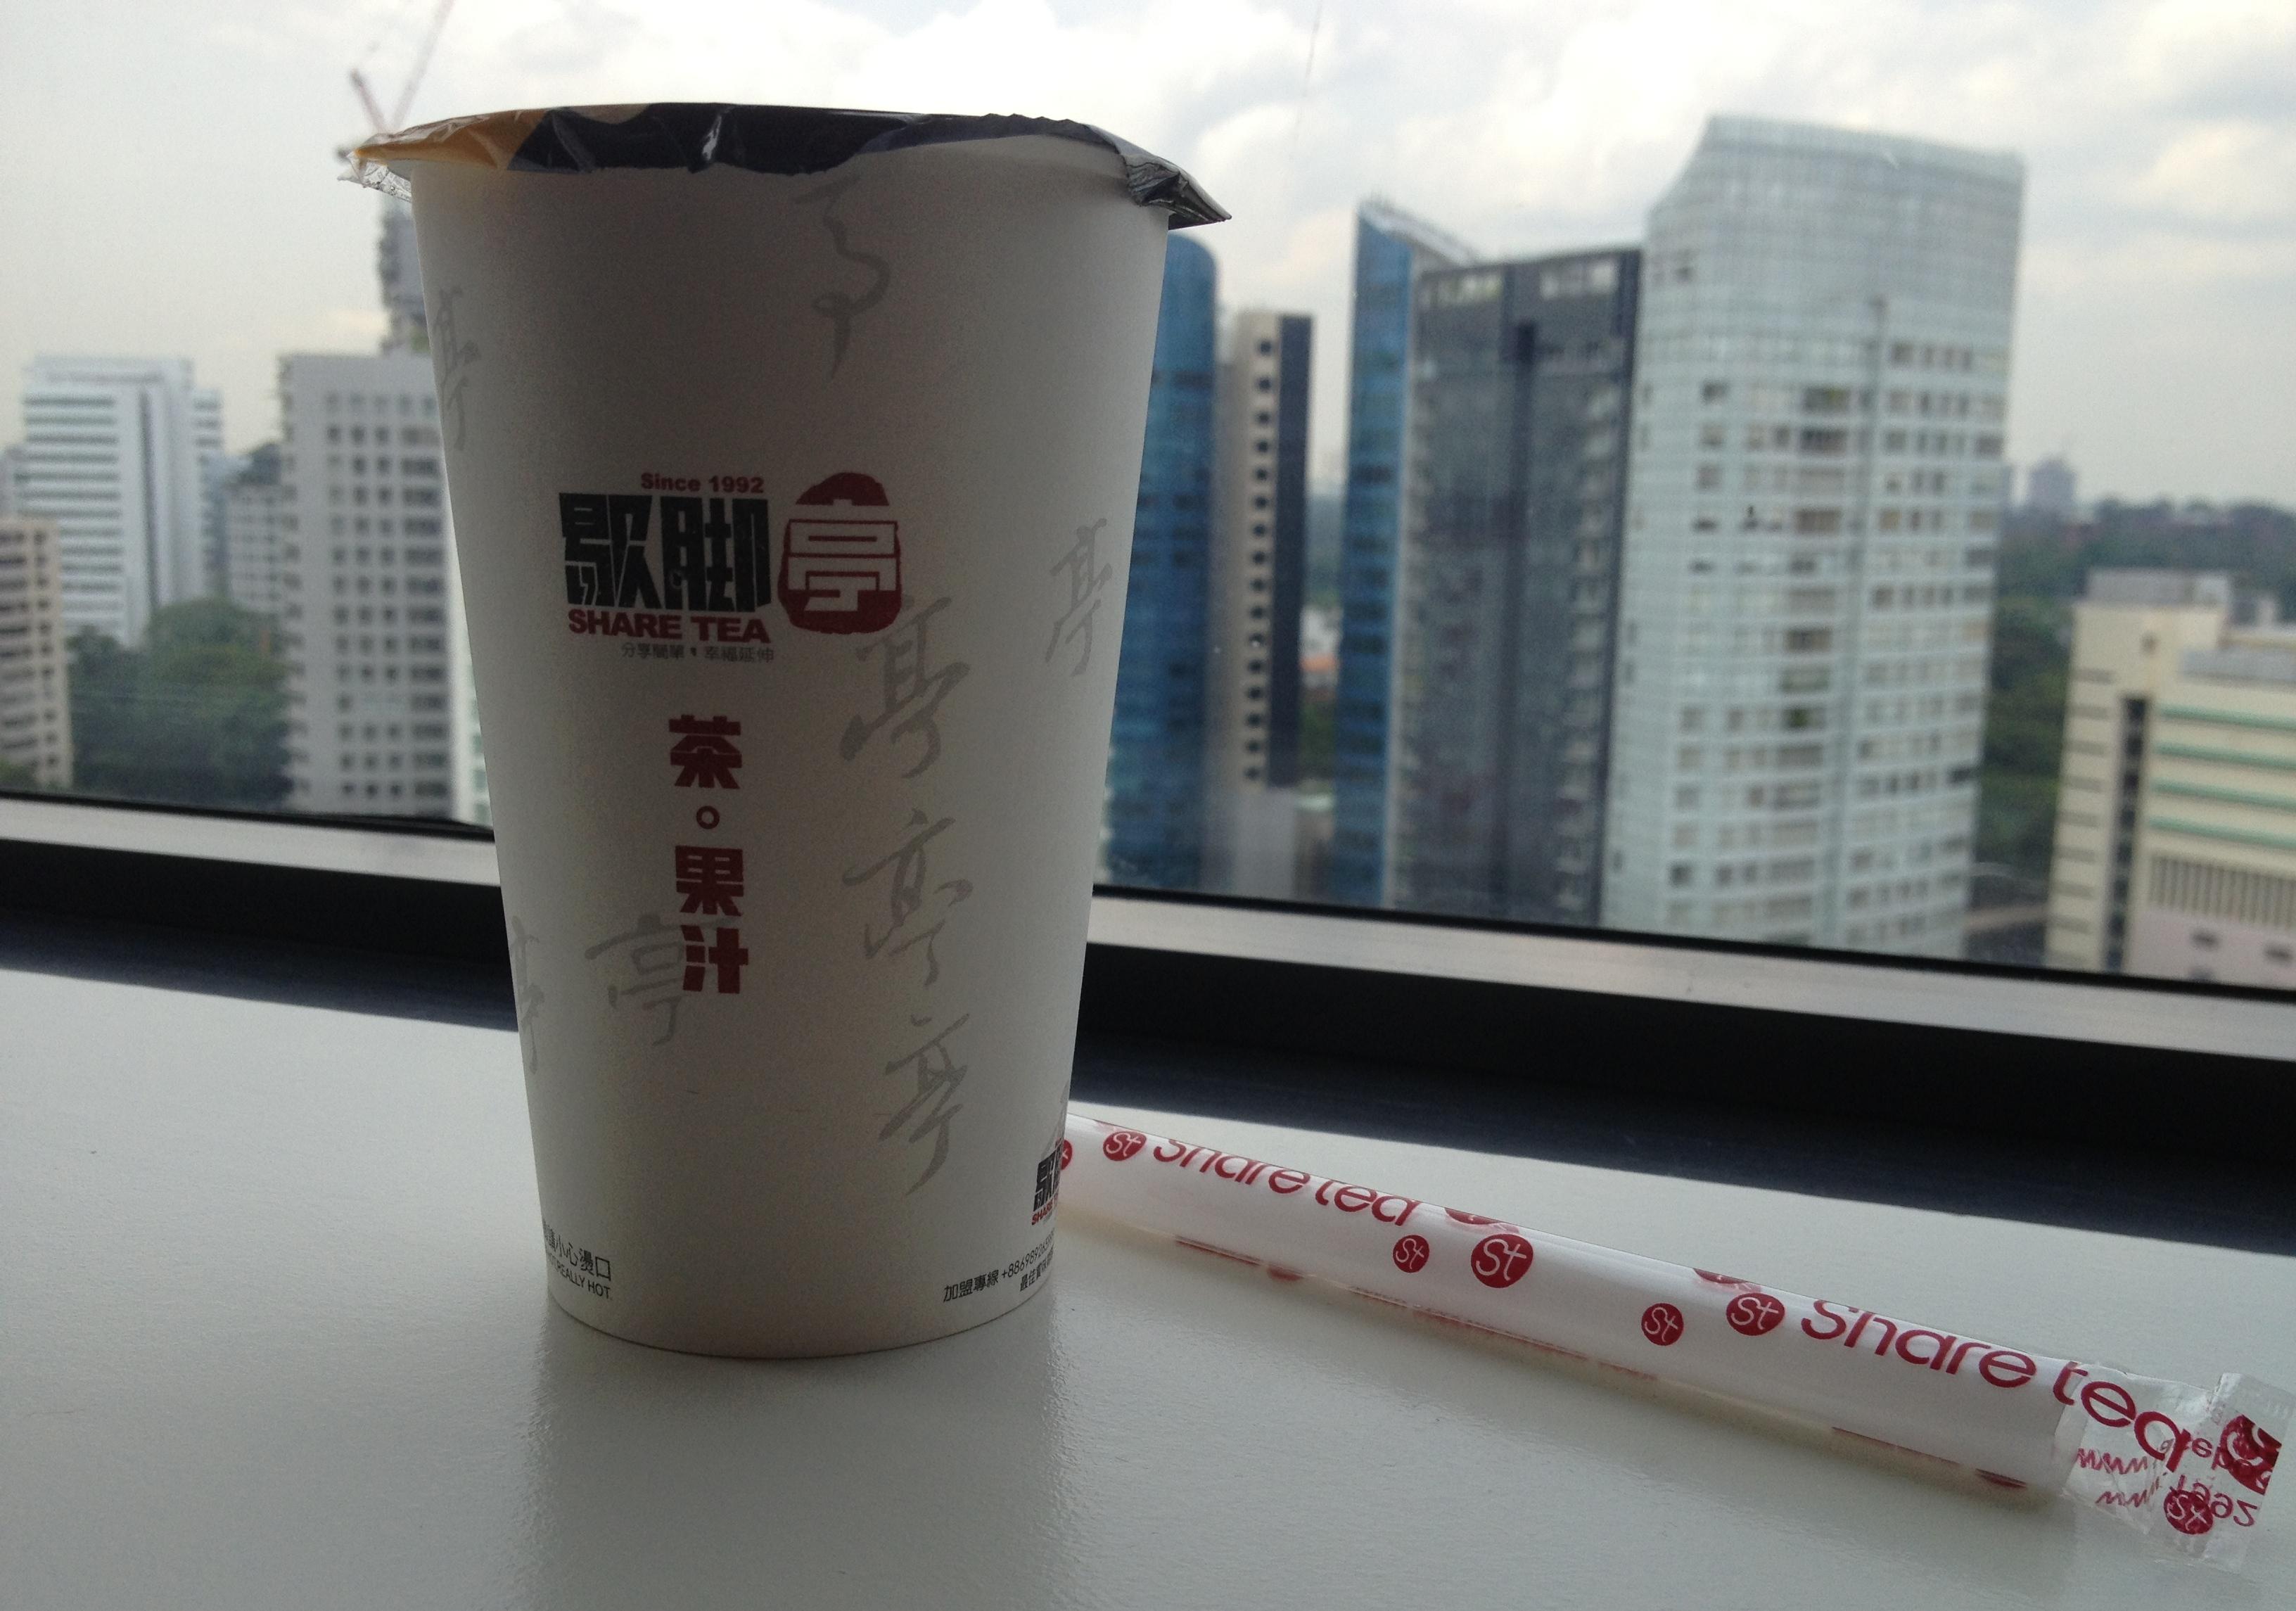 Warm bubble tea by Share Tea